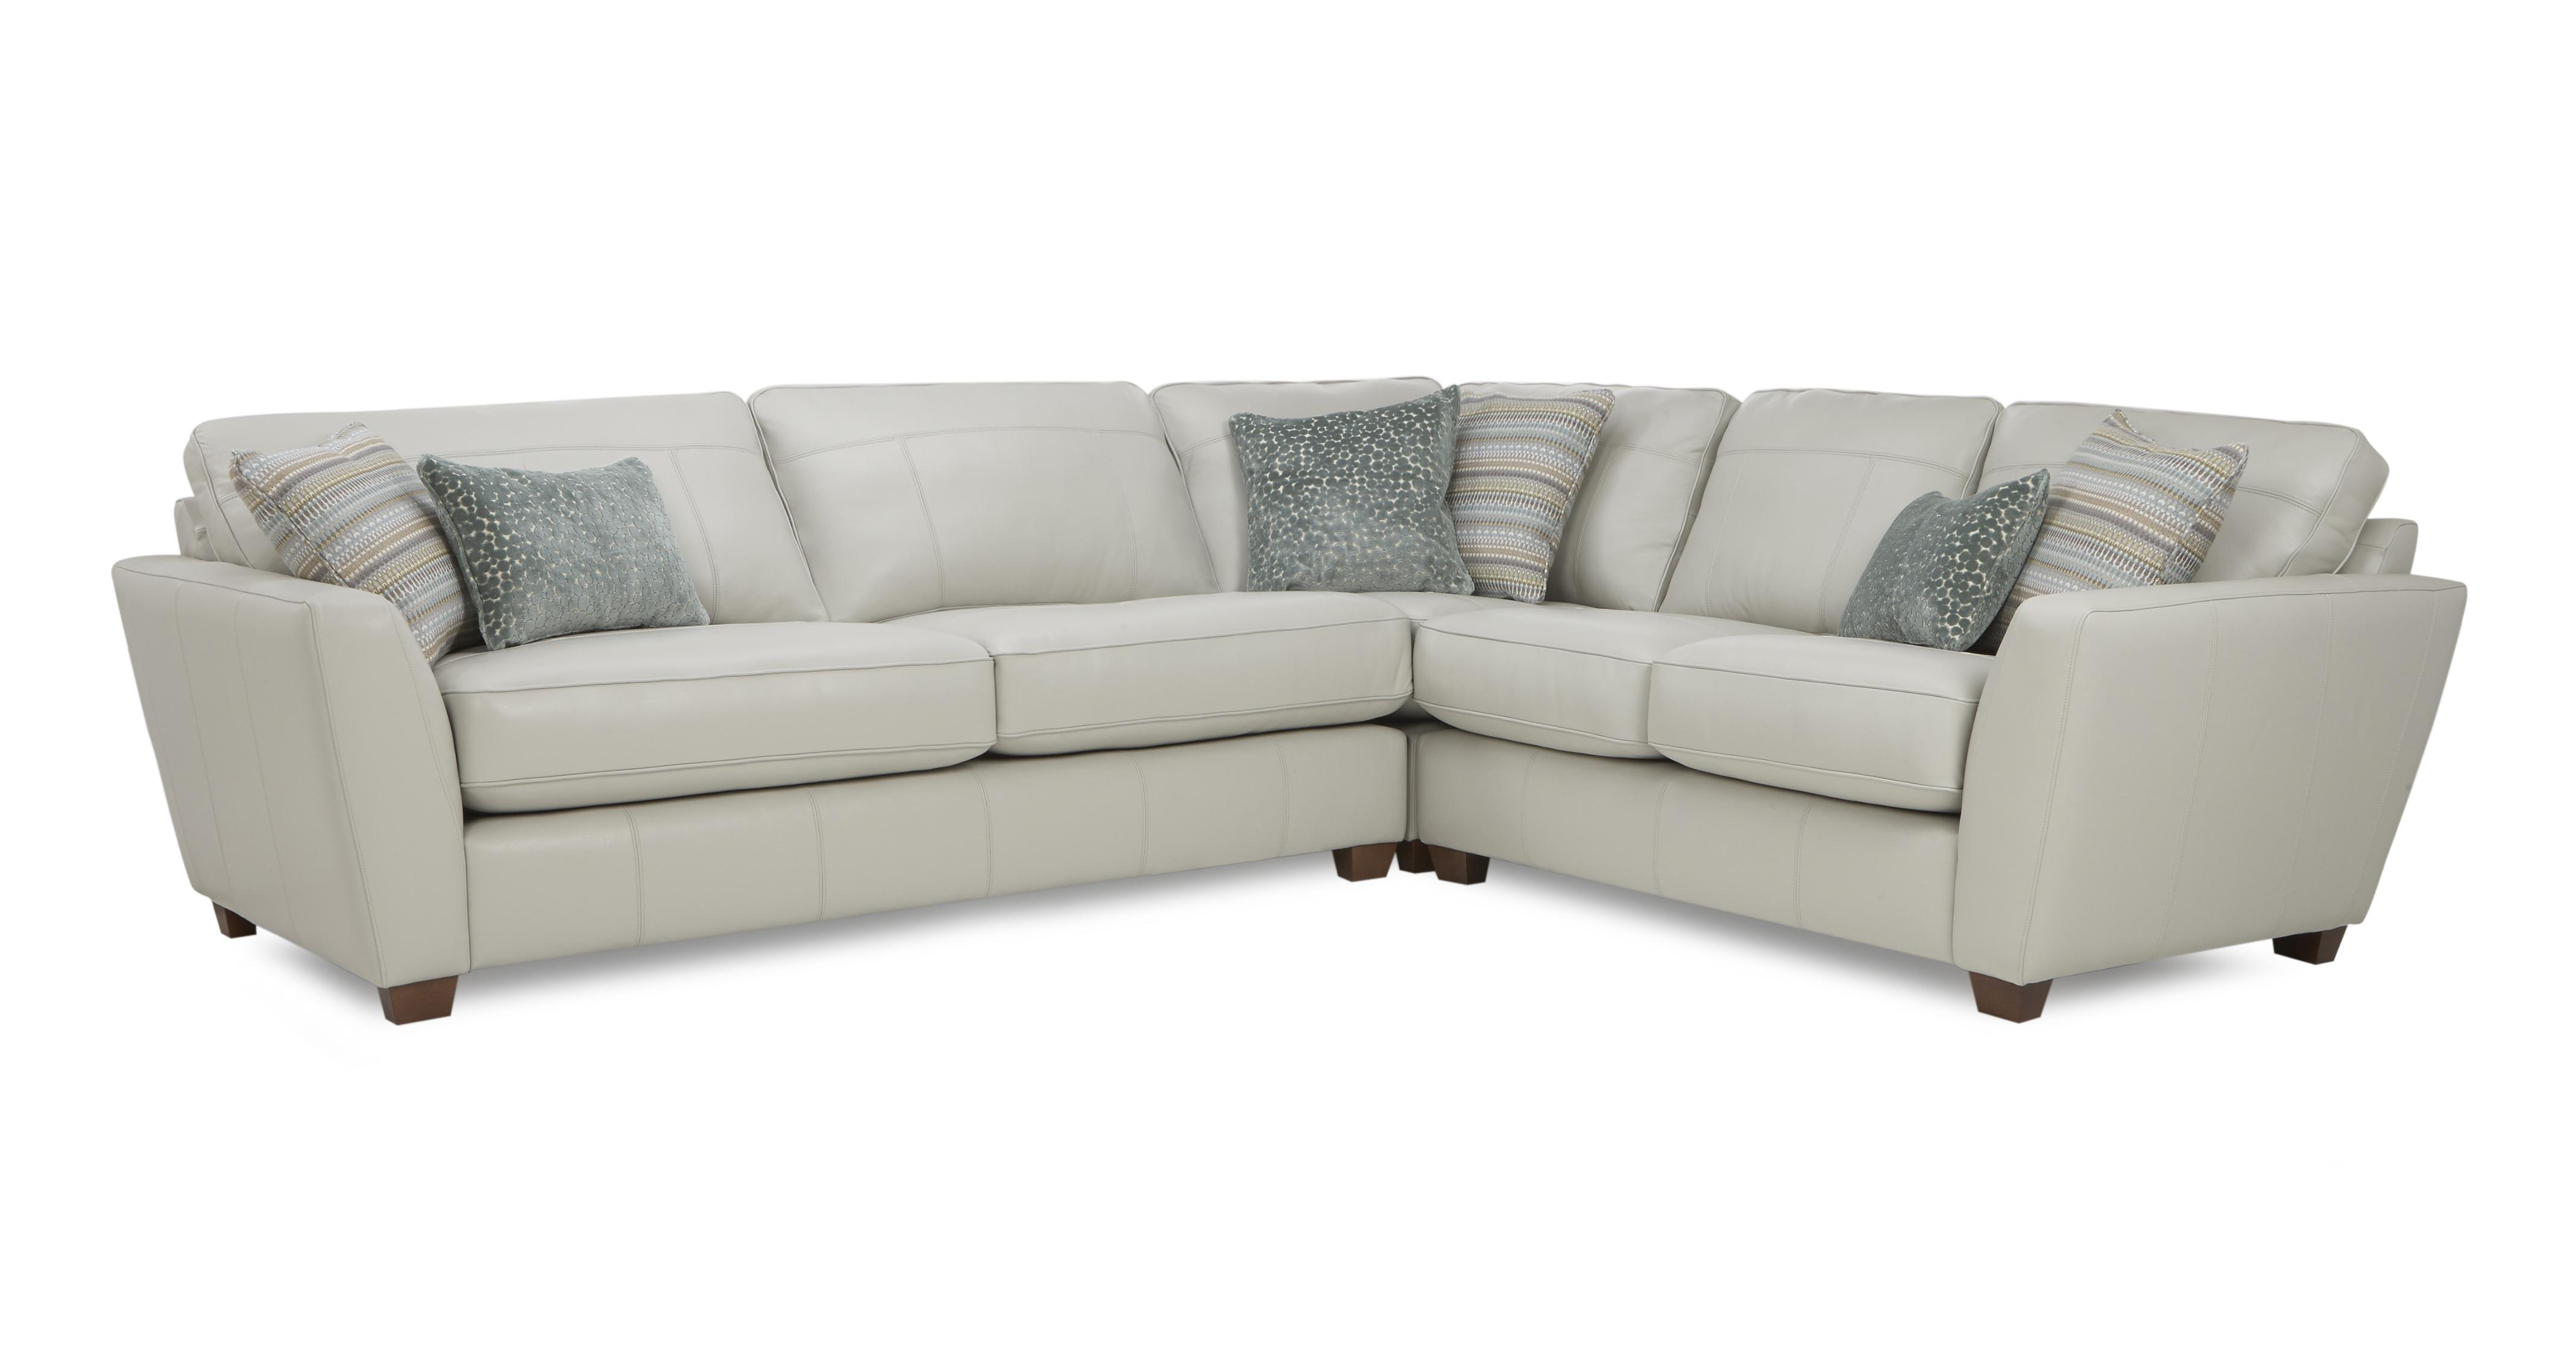 dfs sophia sofa reviews buy uk sale leather left hand facing 3 seater corner group